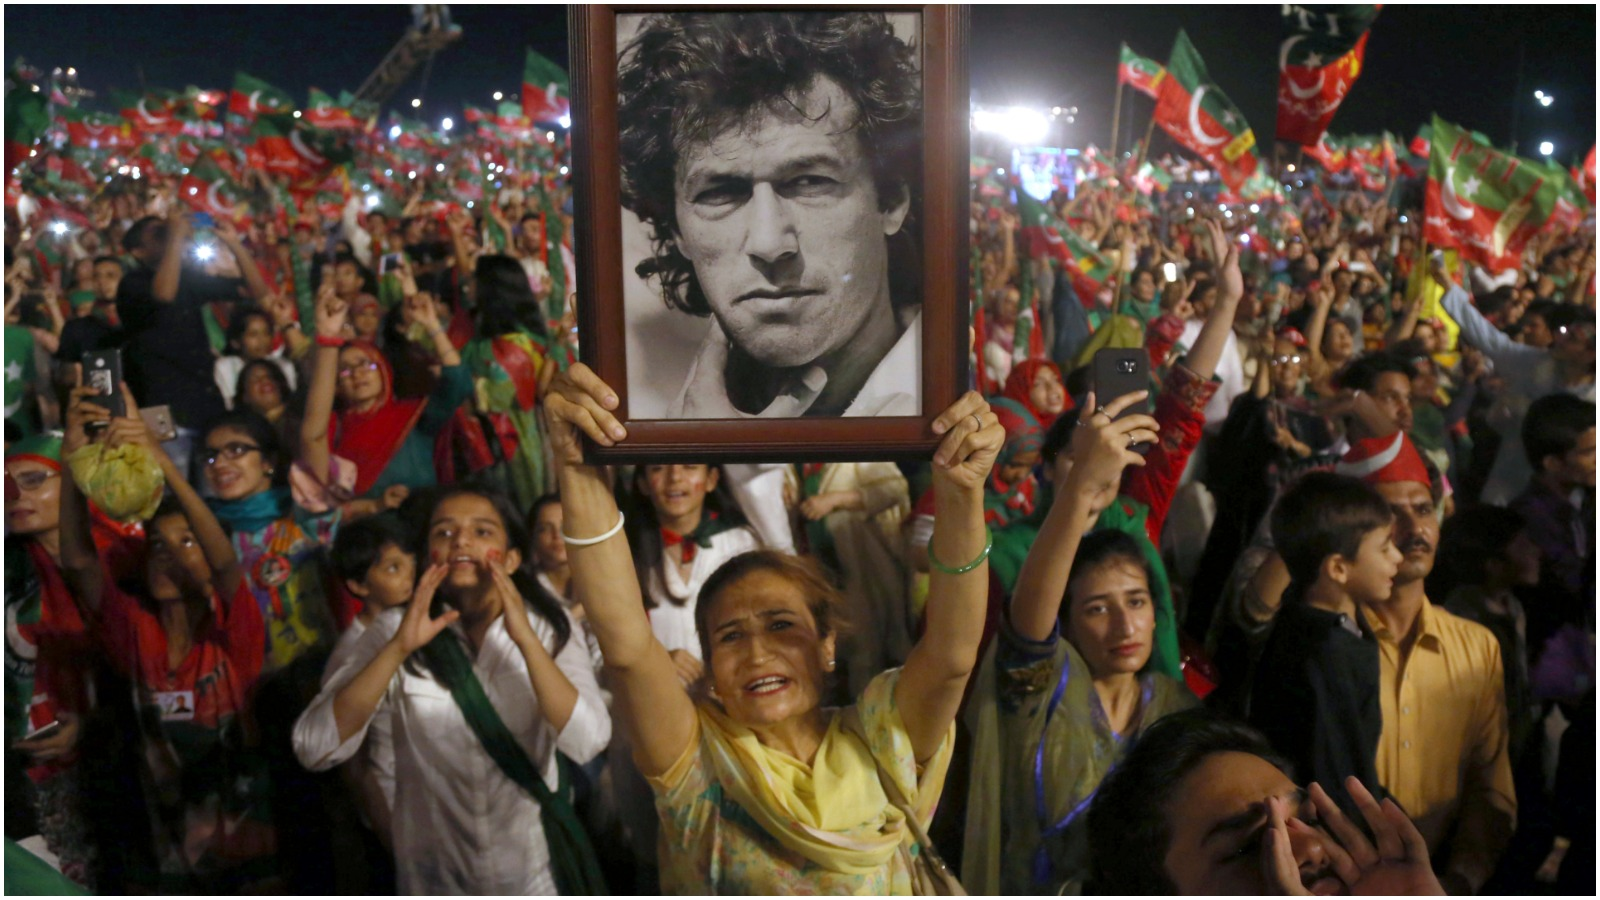 Jonas Stengaard Jensen: Imran Khan har vundet magten med militærets velsignelse. Spørgsmålet er, om han kan løsrive Pakistan fra militærets kontrol?